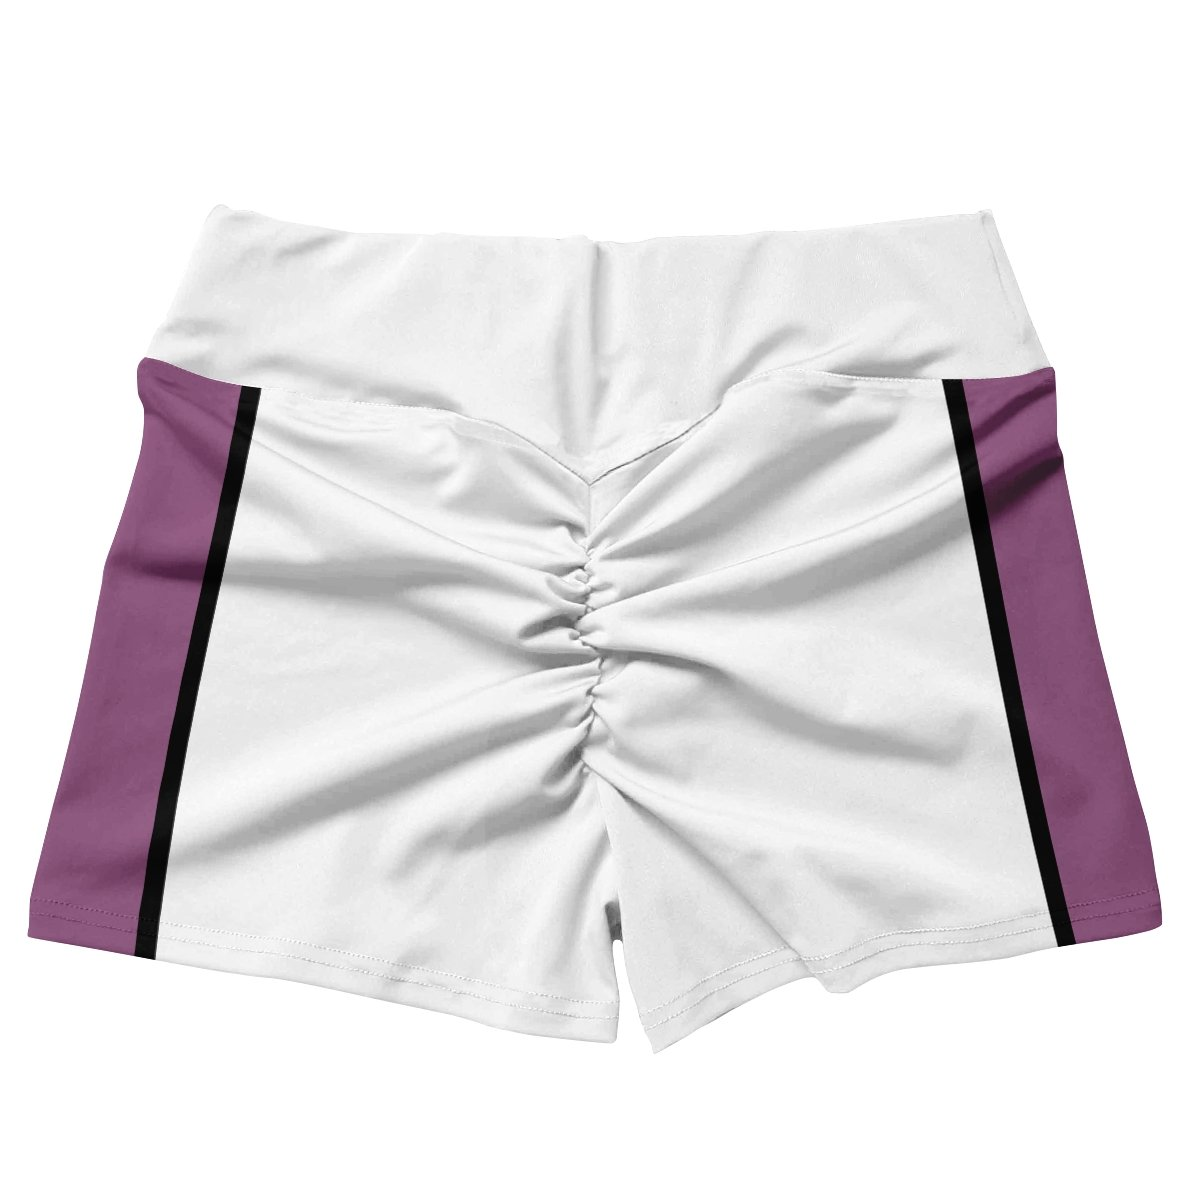 team shiratorizawa active wear set 693684 - Anime Swimsuits